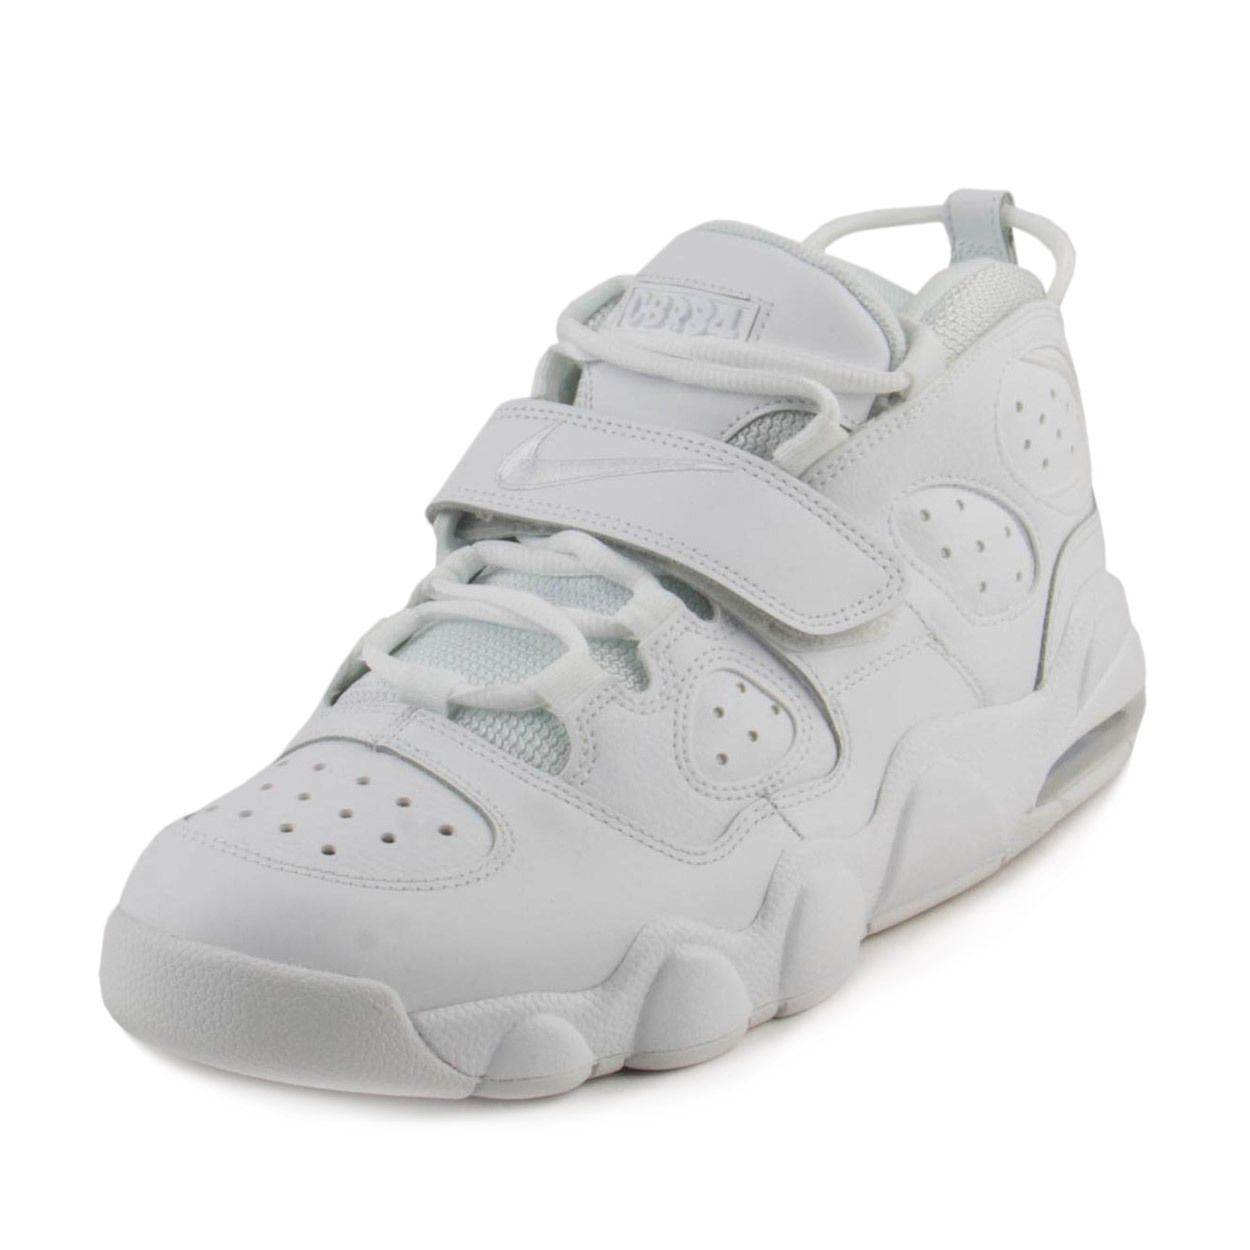 competitive price 39c8e d52cc Nike Mens Air Cb 34 Charles Barkley White 316940-100